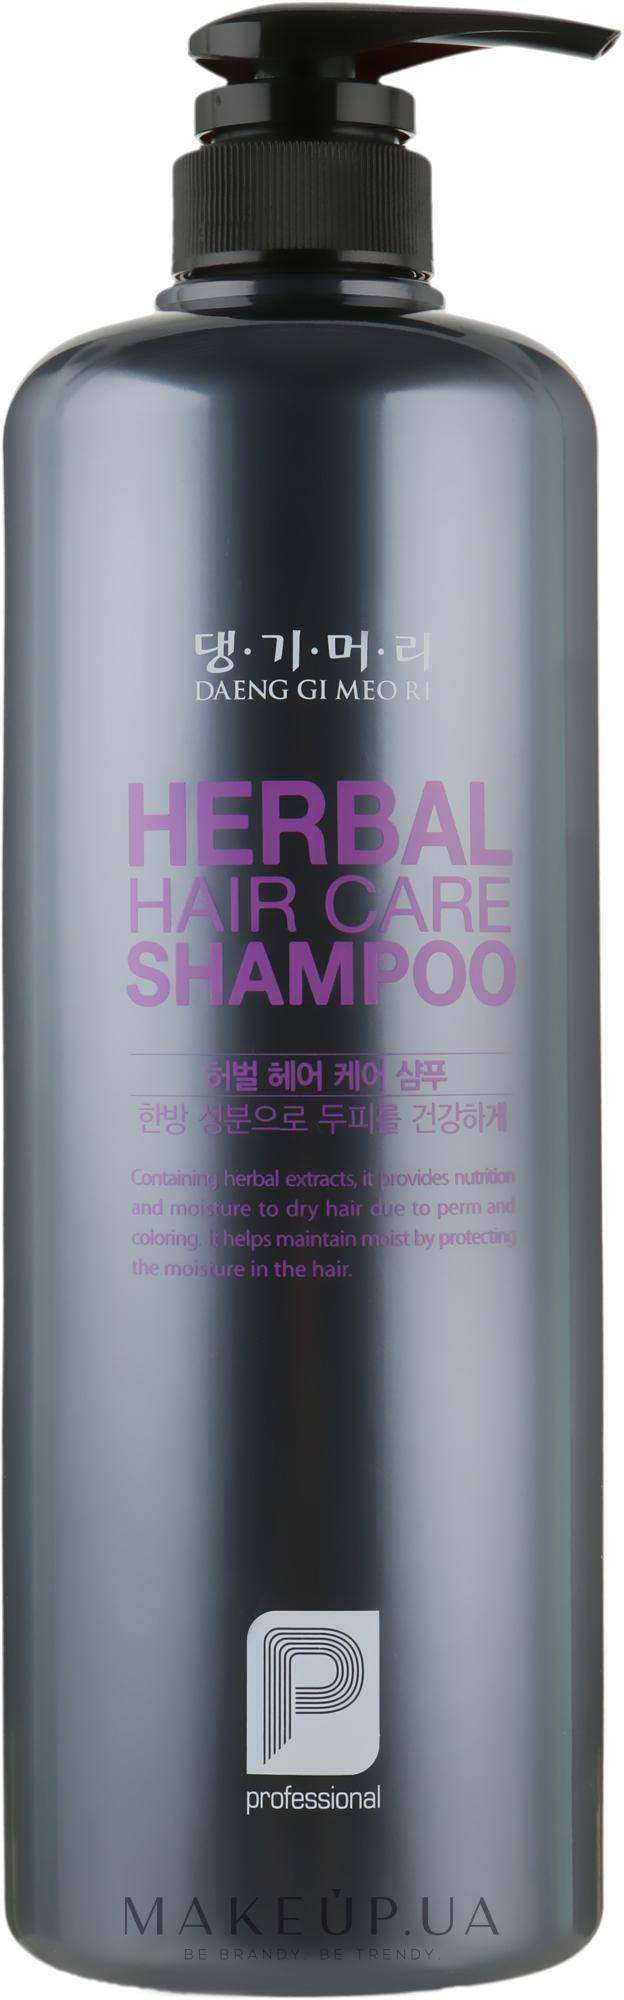 Профессиональный шампунь на основе целебных трав - Daeng Gi Meo Ri Professional Herbal Hair Shampoo — фото 1000ml